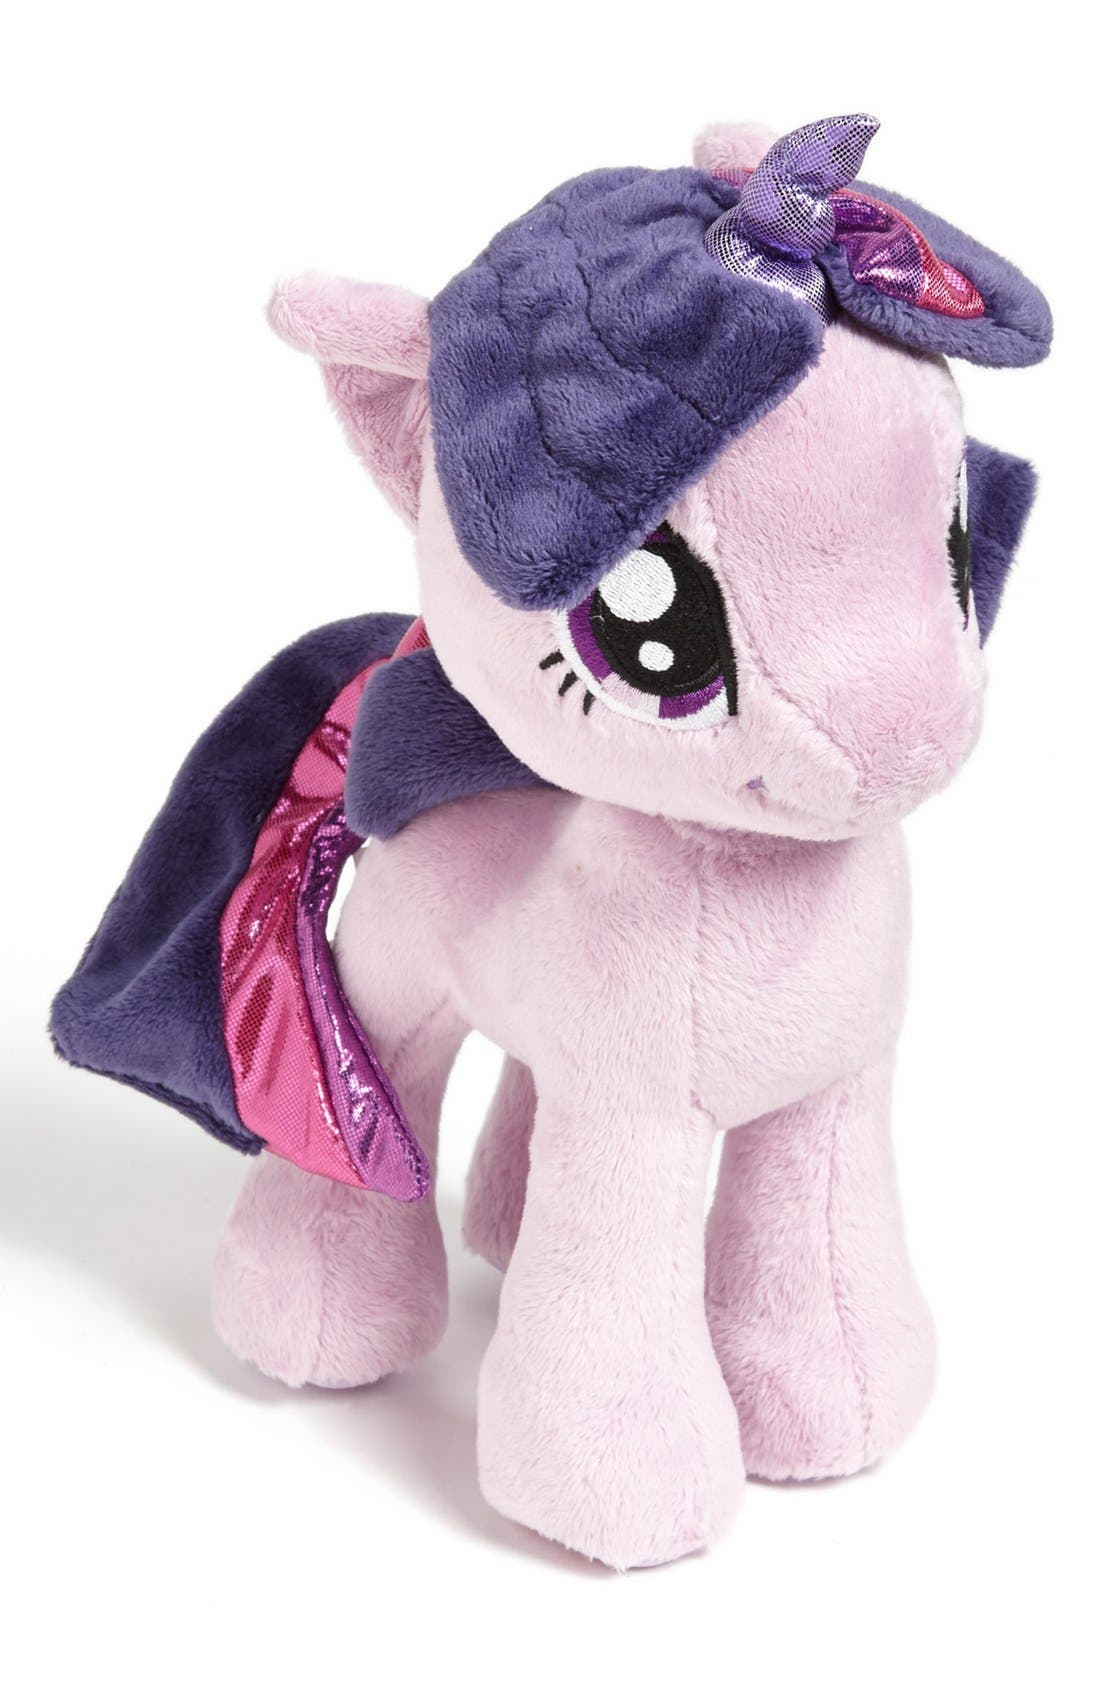 Alternate Image 1 Selected - Aurora World Toys 'My Little Pony® - Twilight Sparkle®' Stuffed Animal (10 Inch)